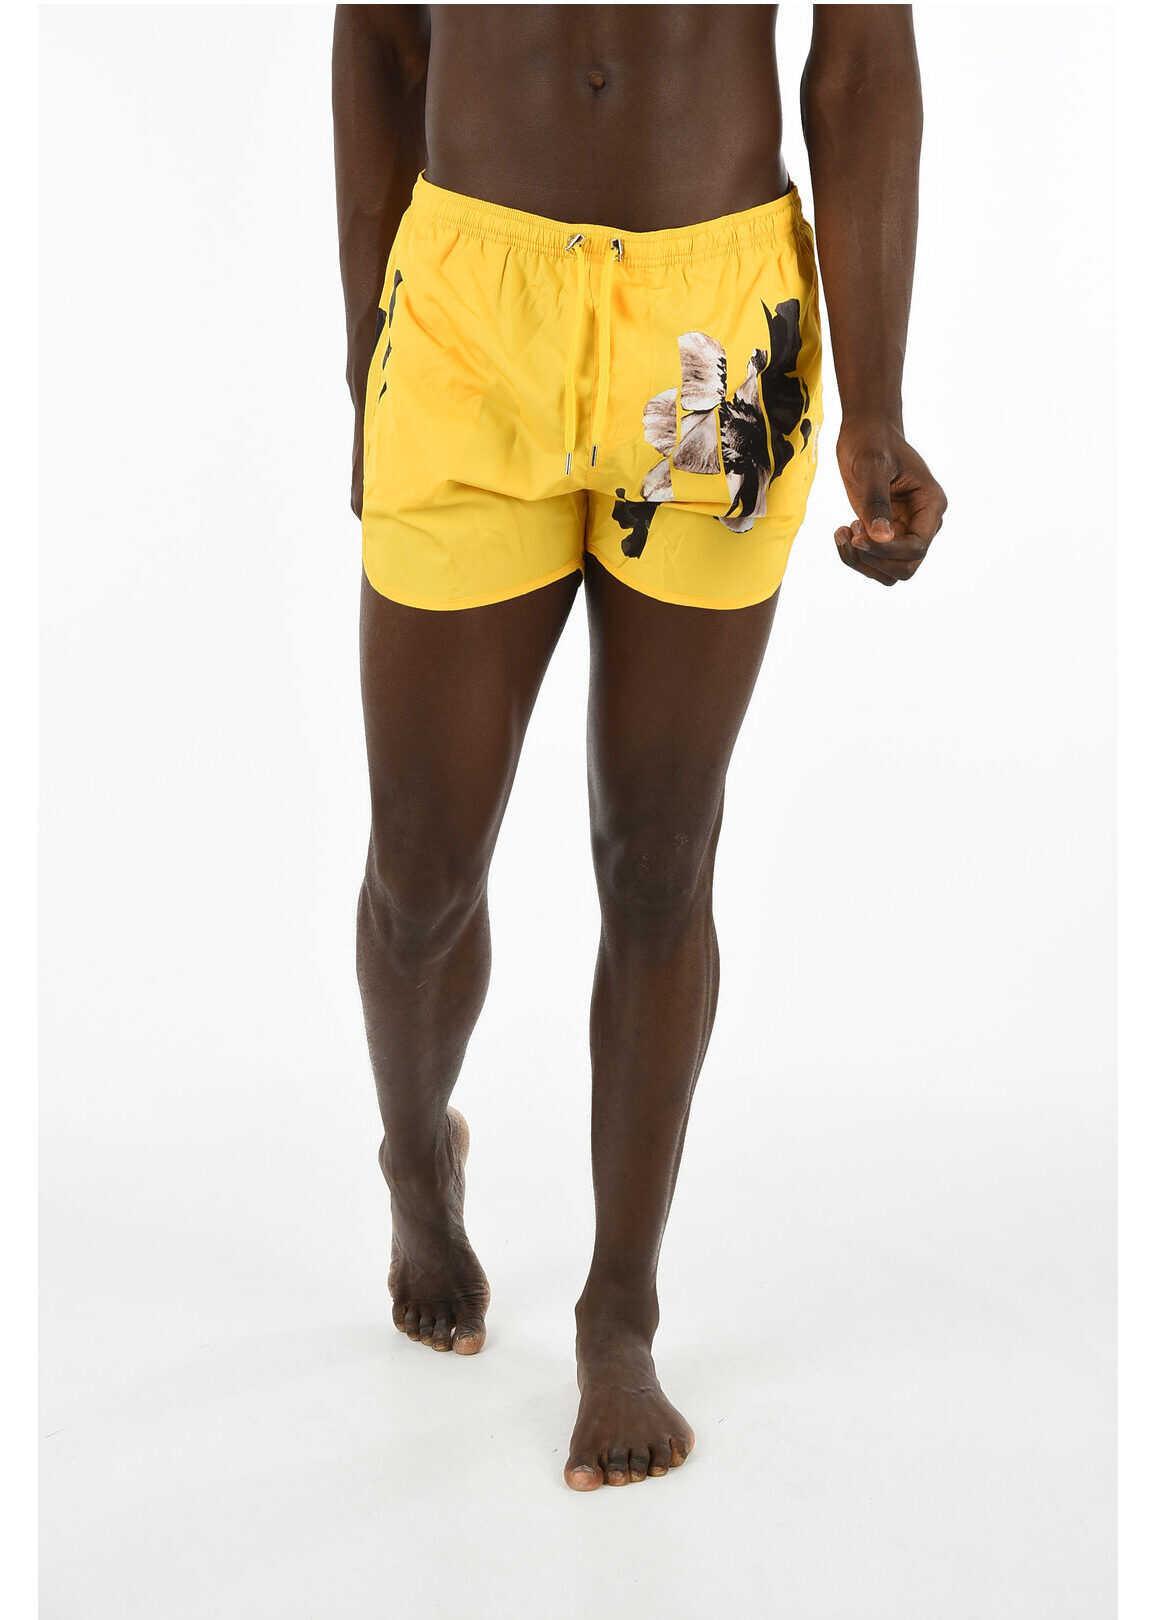 Neil Barrett floral-print boxer beachwear YELLOW imagine